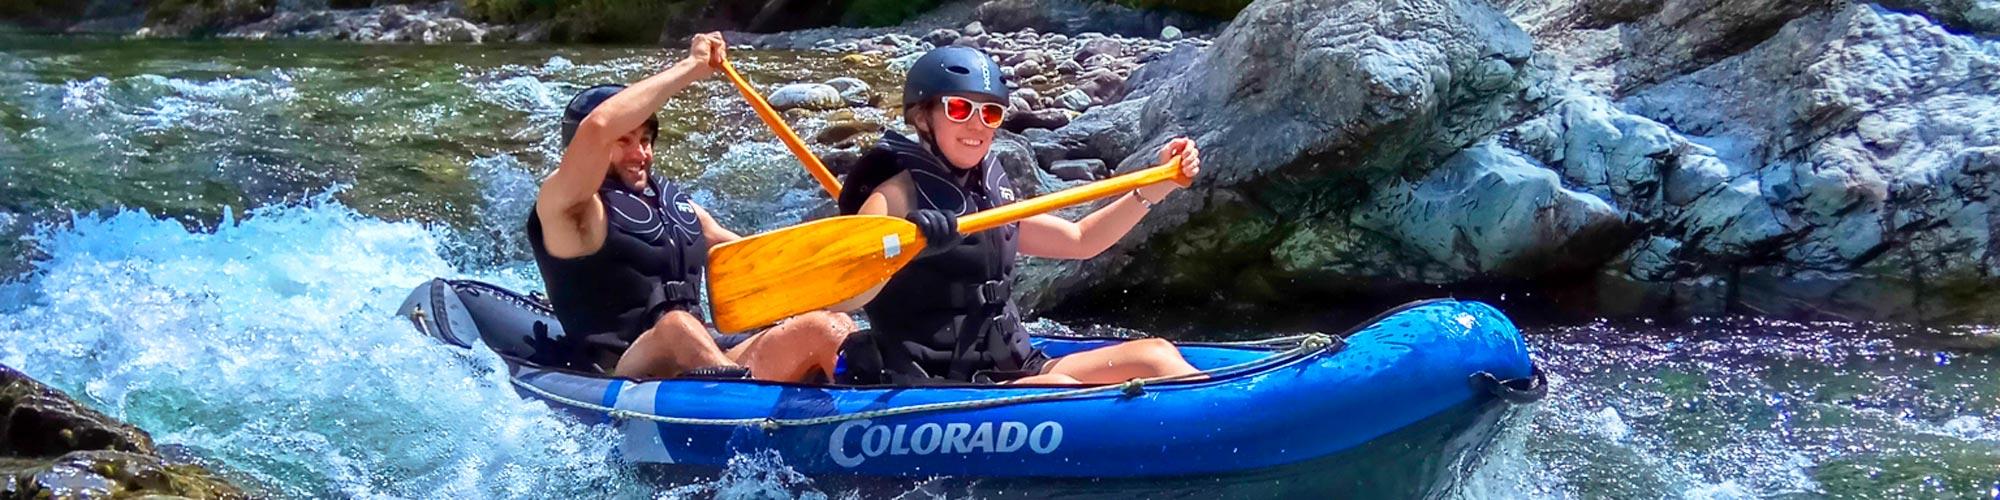 Kayak Guide Job Opportunity New Zealand Banner